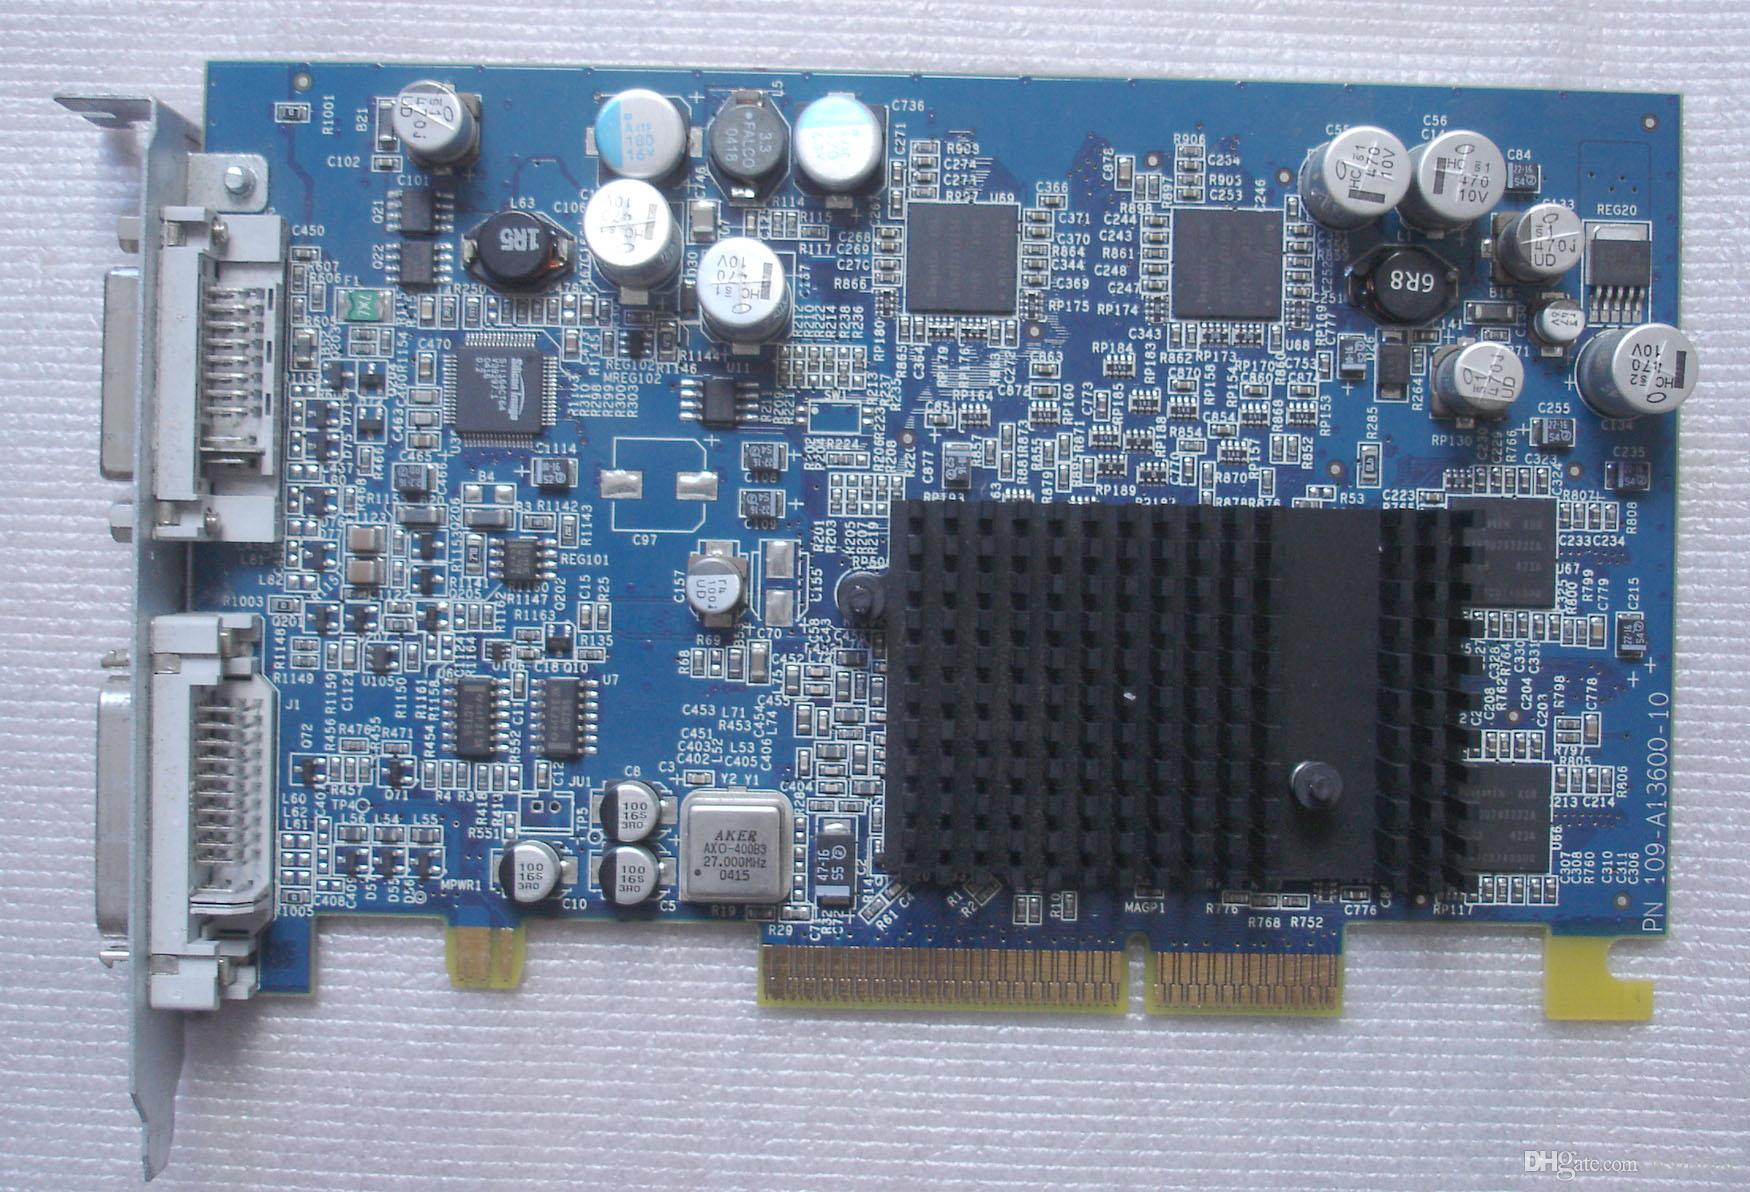 661-3230 603-4625 630-6448 661-3230 109 A13600-10 630-6630 راديون 9600 128MB ذاكرة AGP بطاقة ADC + DVI الرسومات الفيديو لقوة A1047 G5